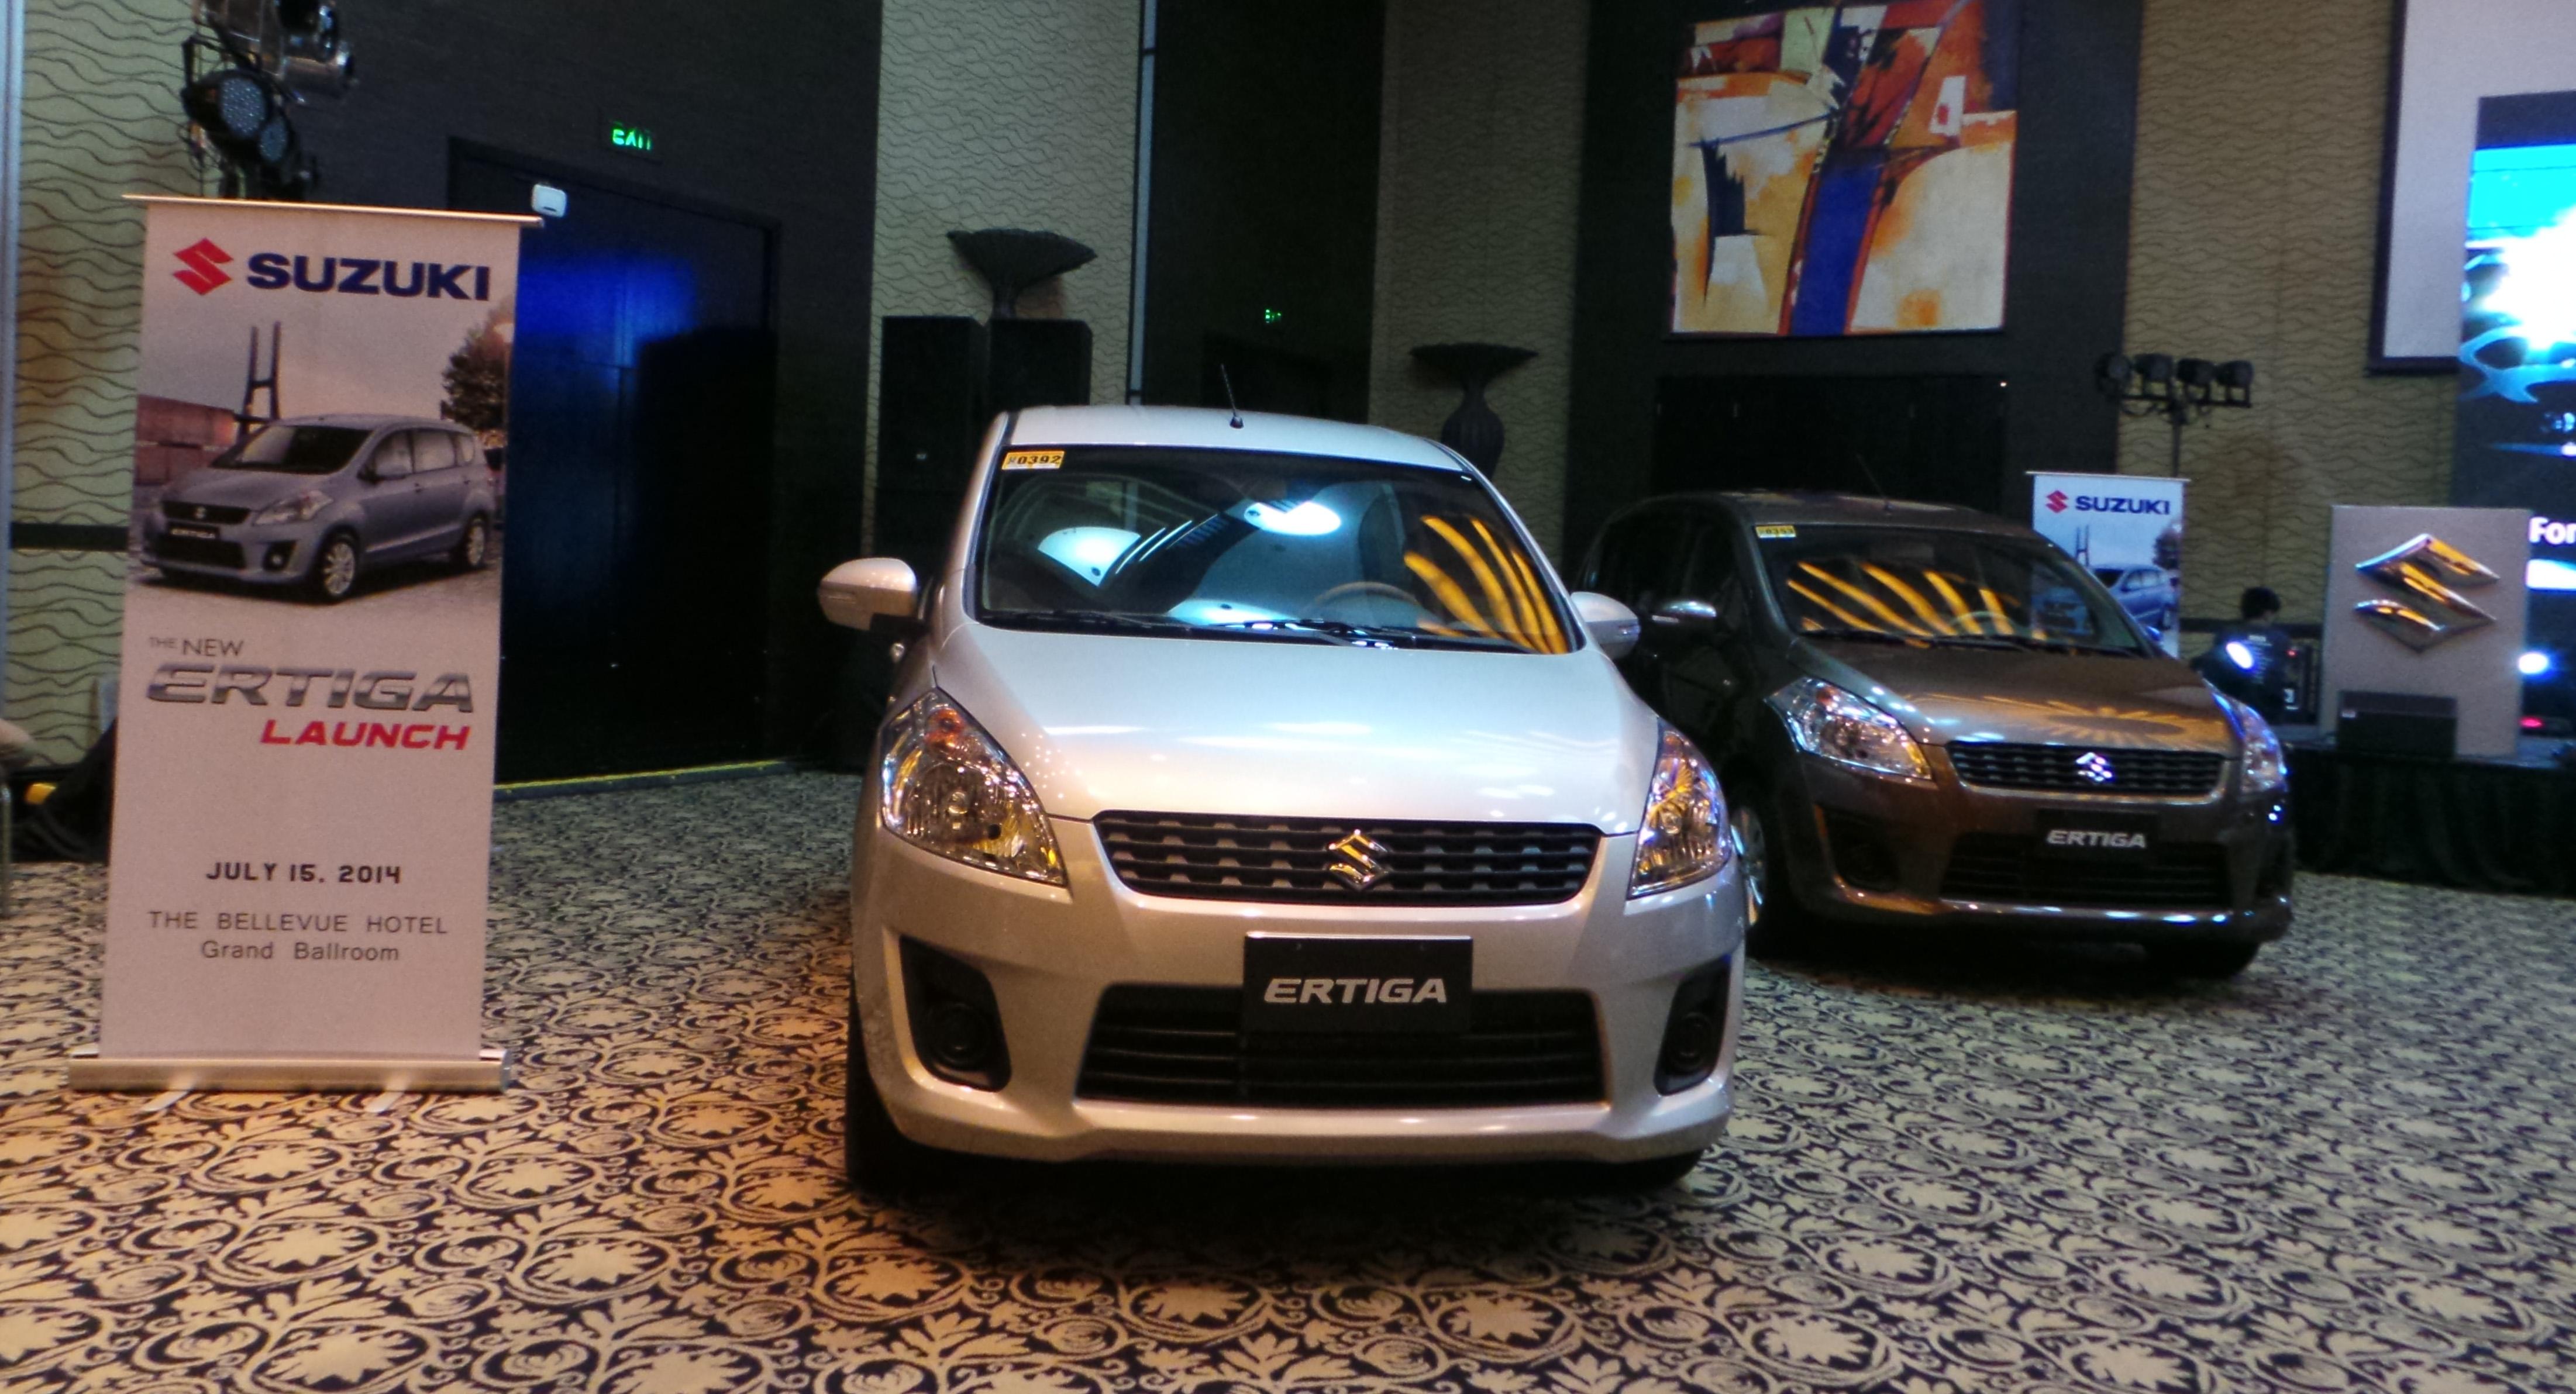 Suzuki Ertiga a 7-seater family Car, Fuel-efficient and feature-rich